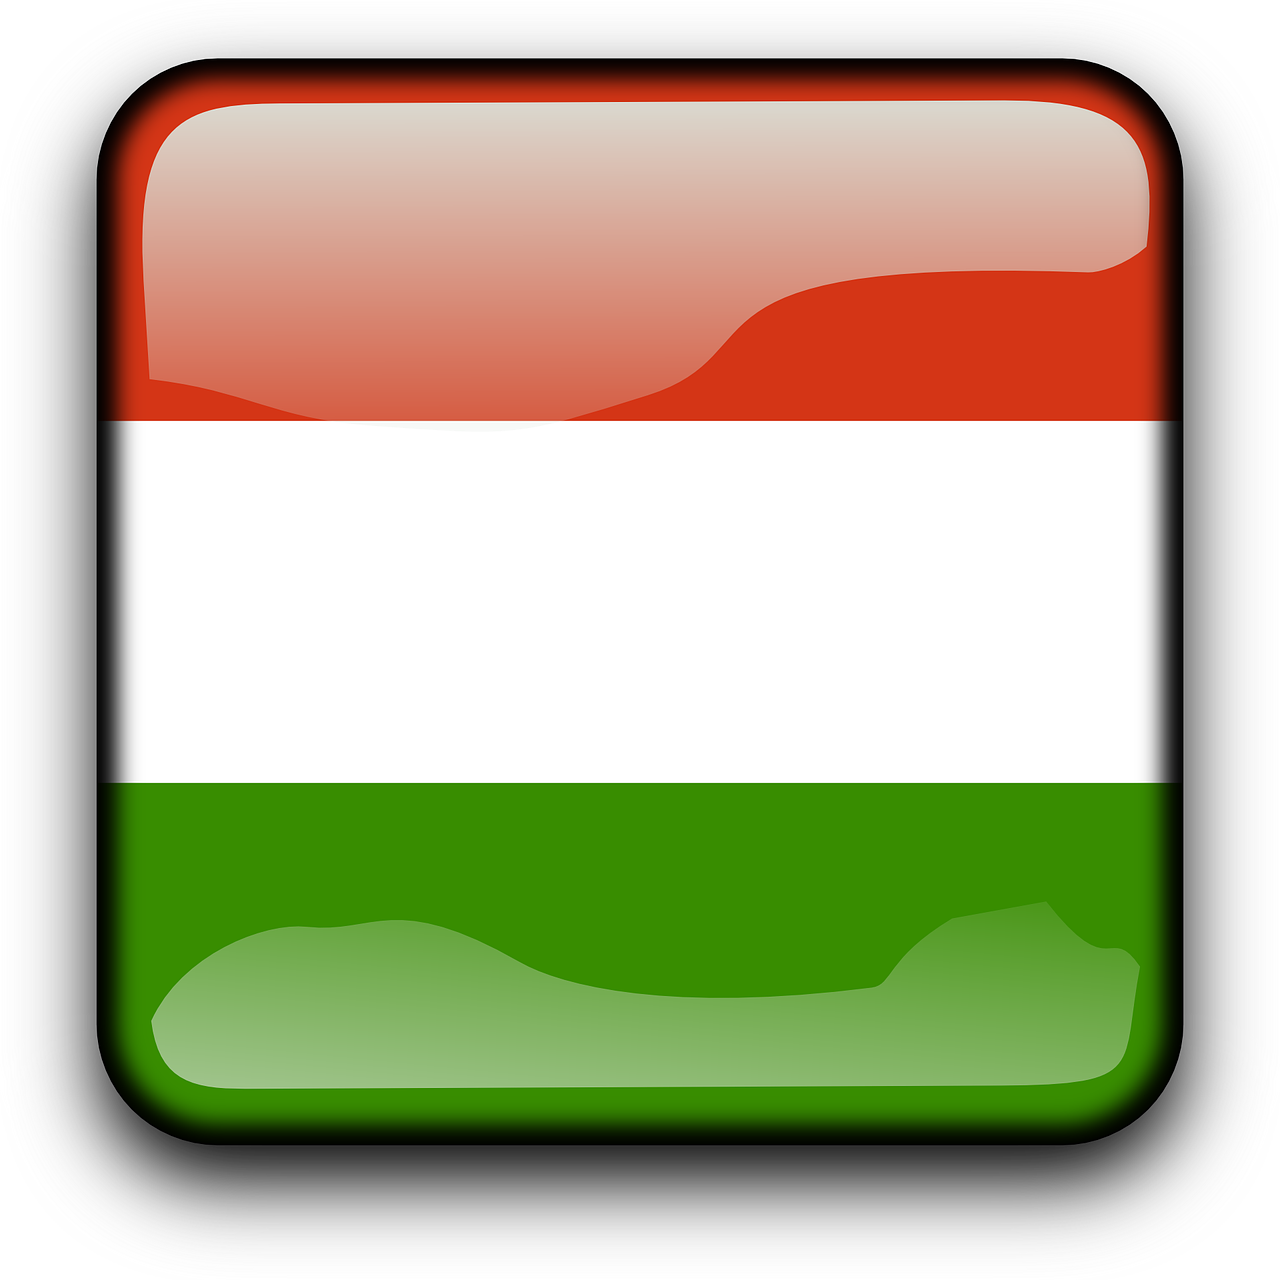 Ungarn Reisen - Flagge